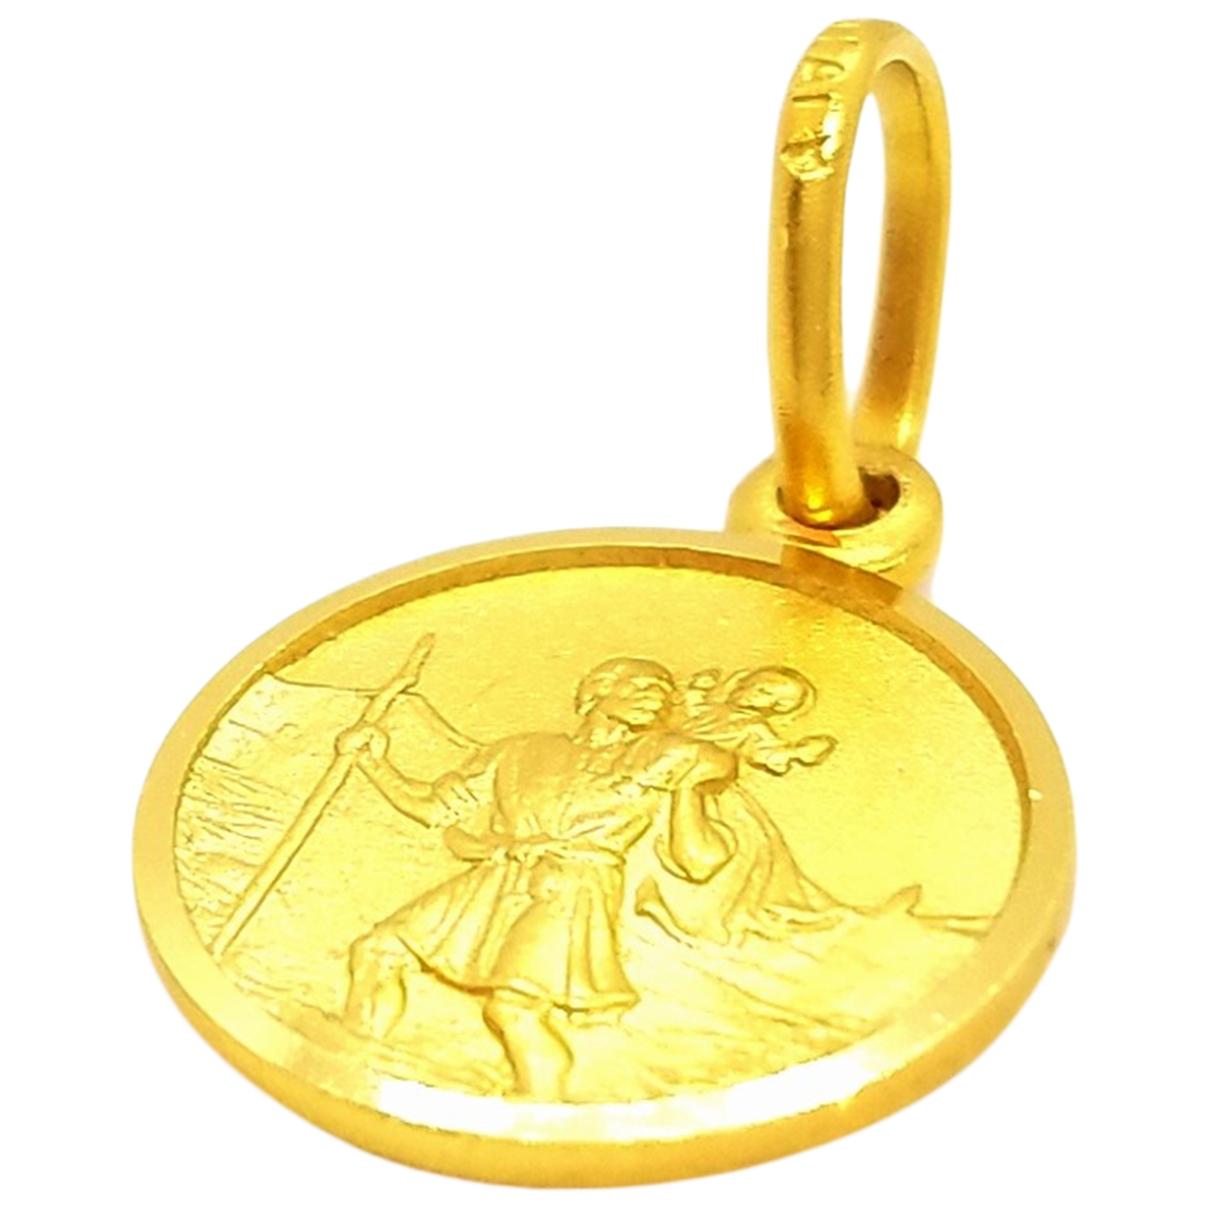 Colgante de Oro amarillo Autre Marque